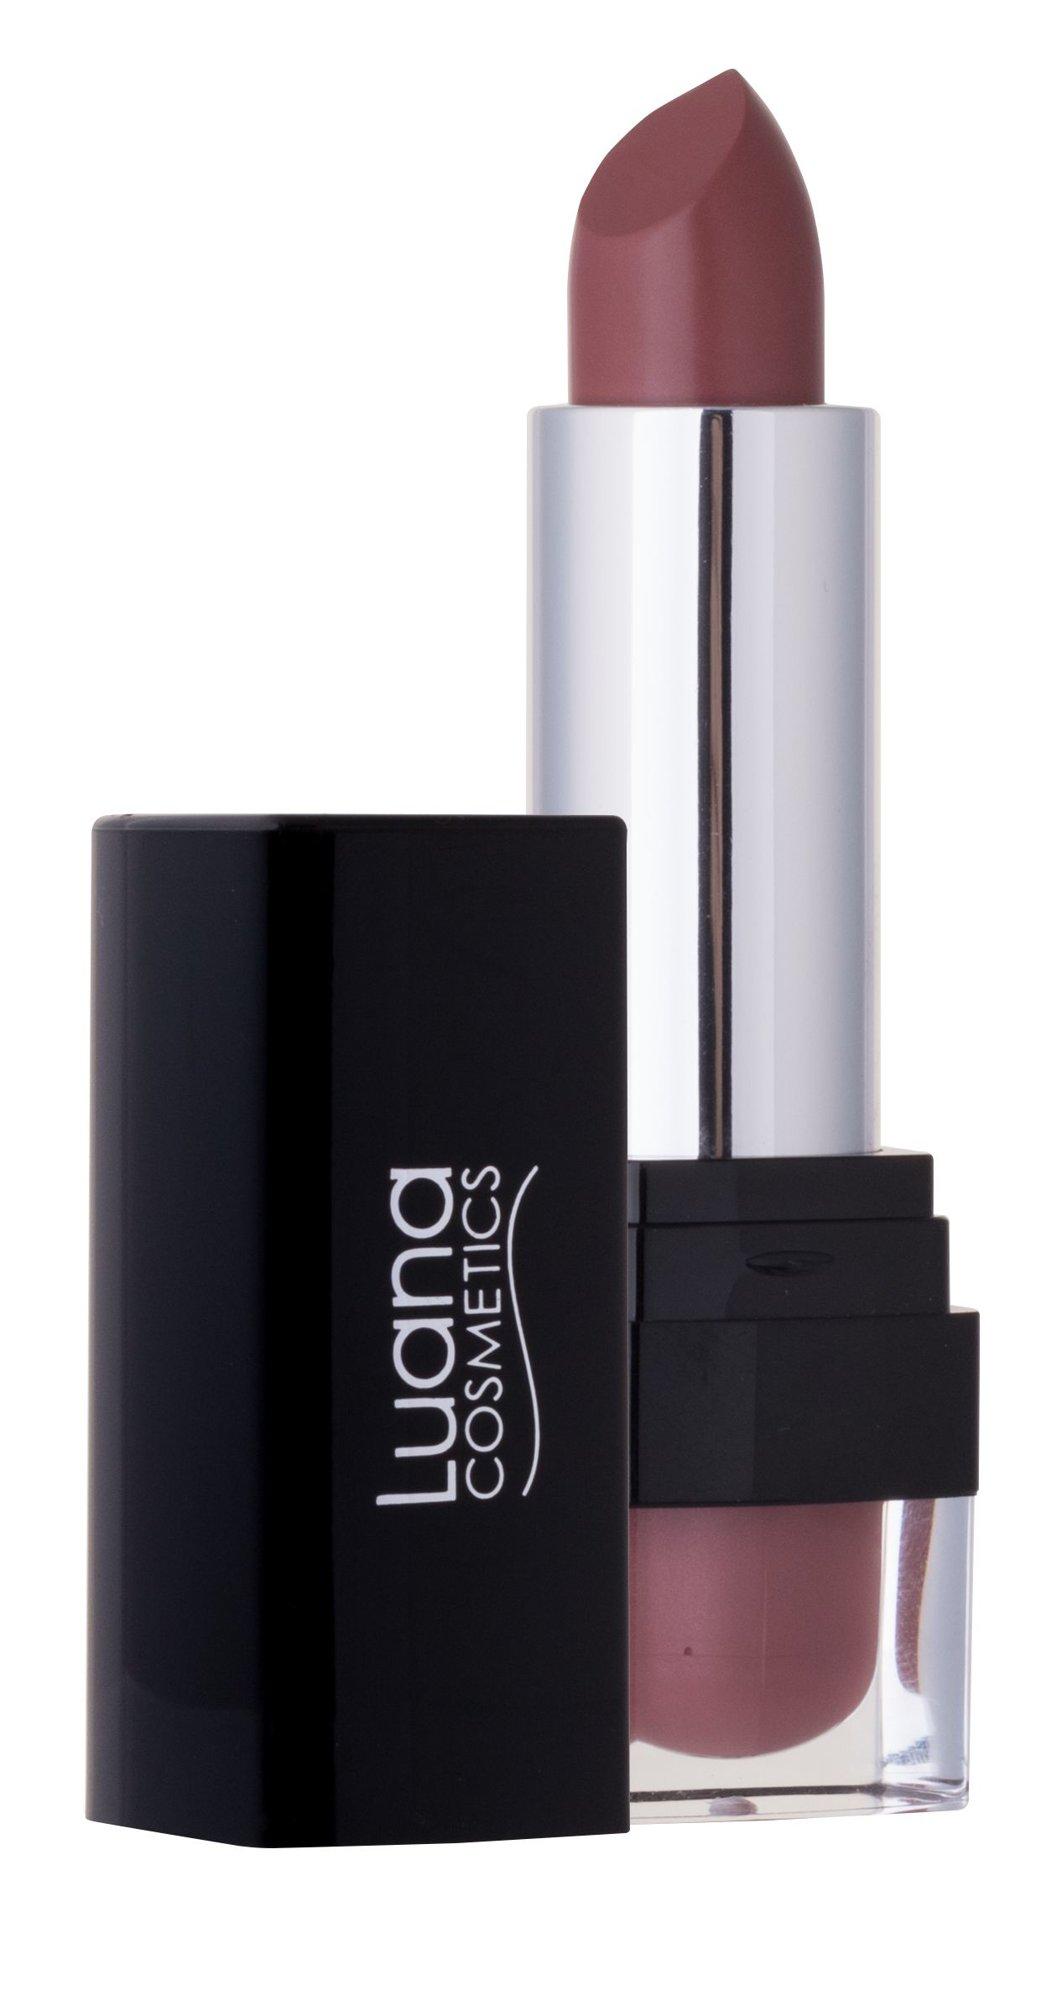 Luana Cosmetics Lipstick Cosmetic 3,5g Shine Rose